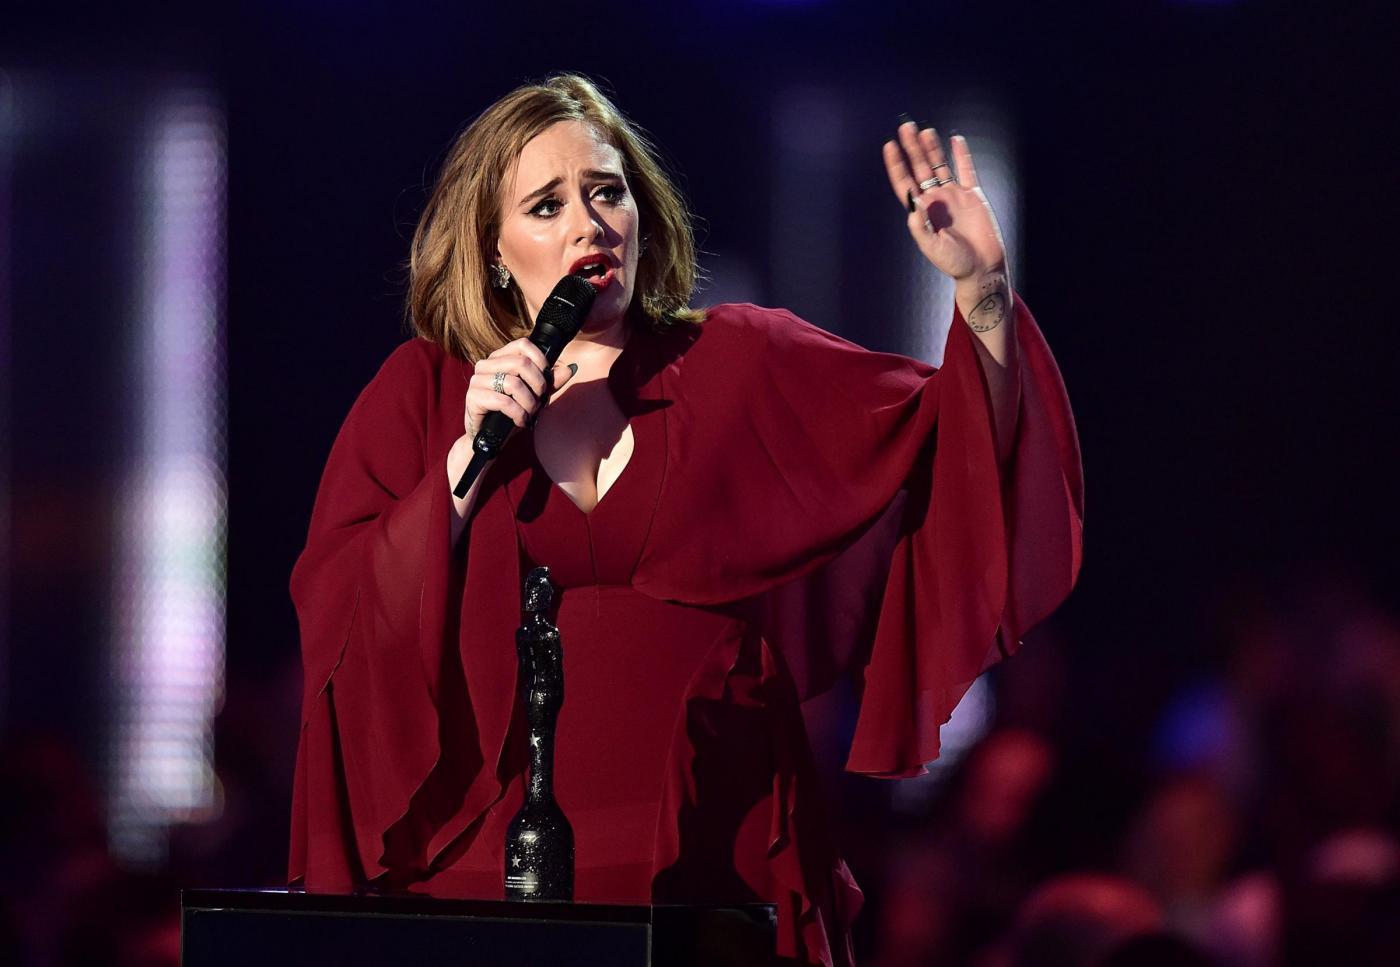 Adele Arena di Verona